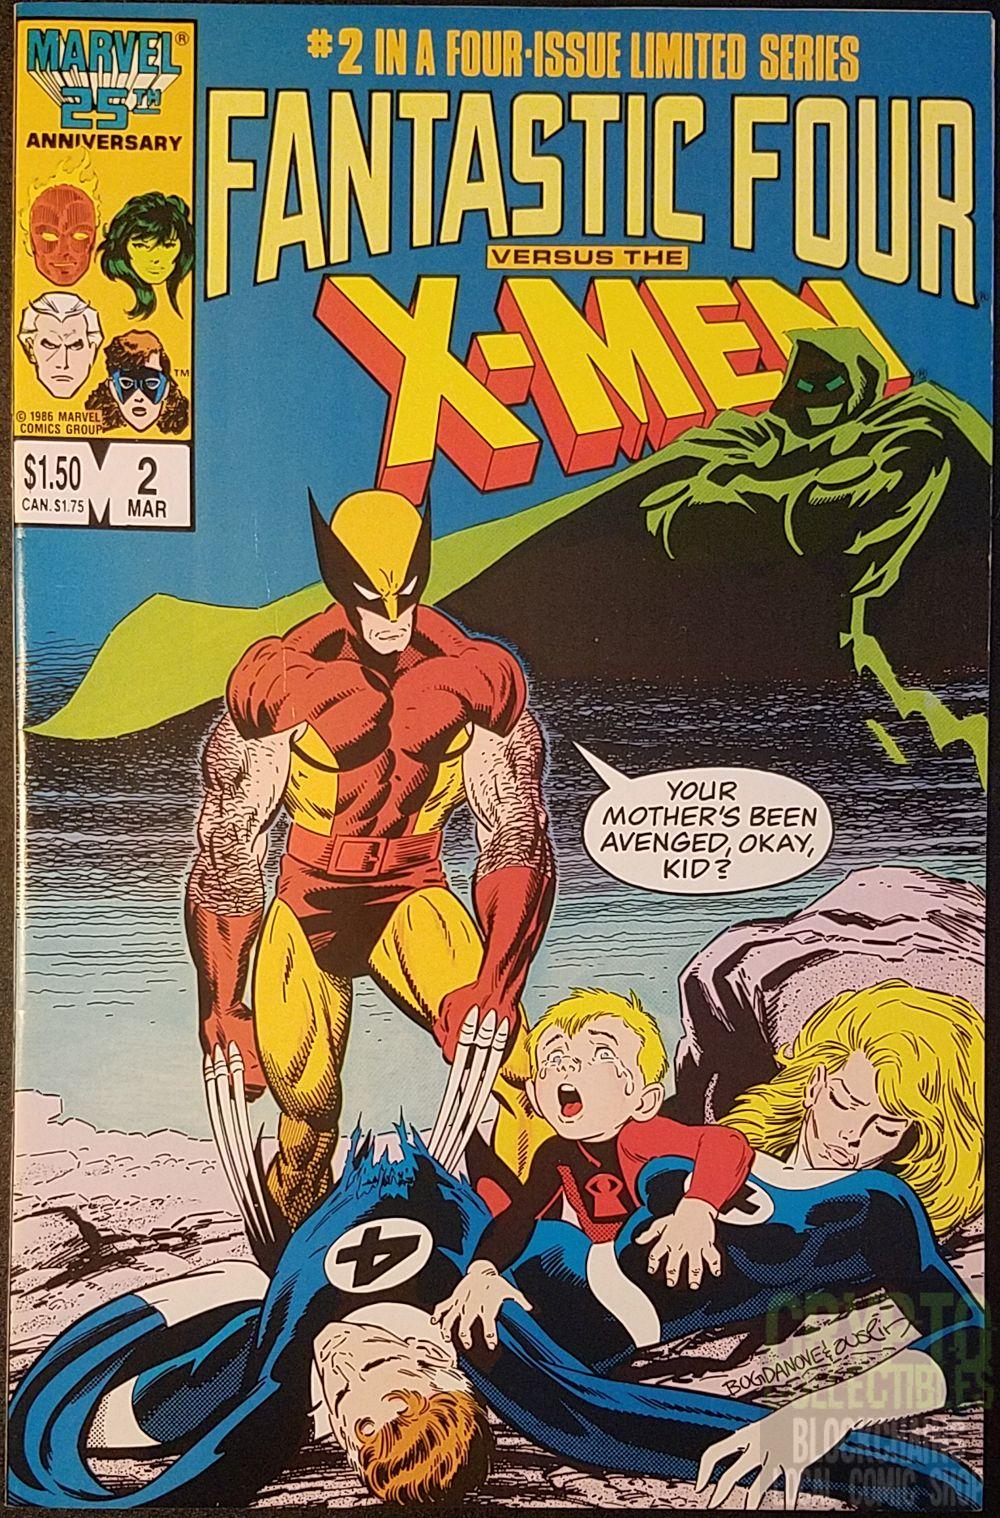 Fantastic Four Versus The X Men 2 By Chris Claremont Jonbogdanove And Terryaustin Fantasticfour Classic Comic Books Fantastic Four Comics Classic Comics